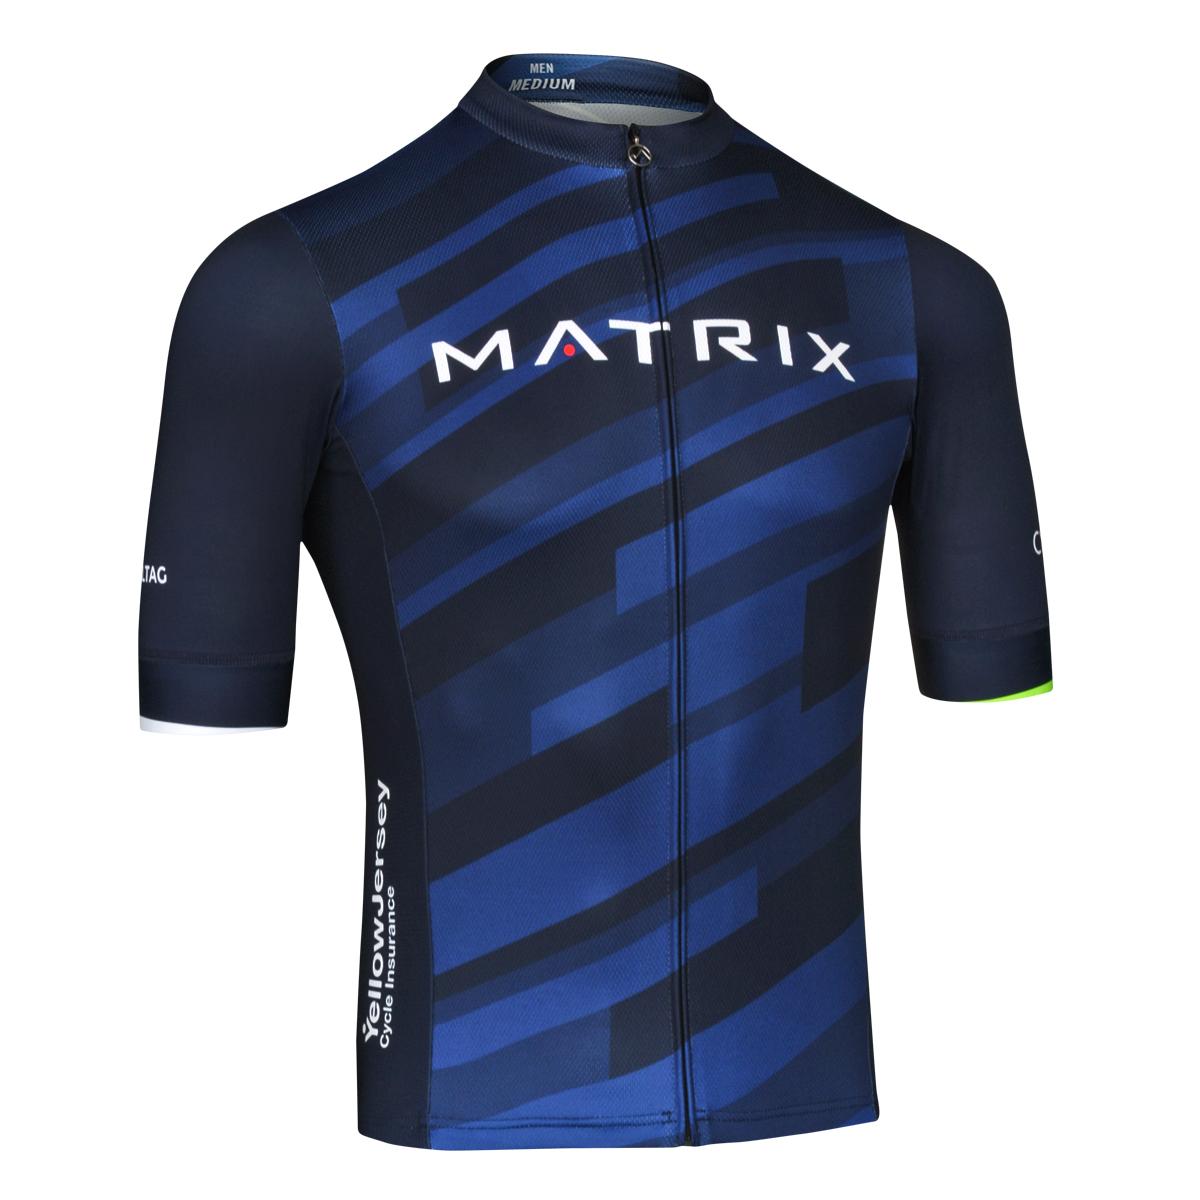 Matrix Jersey Front